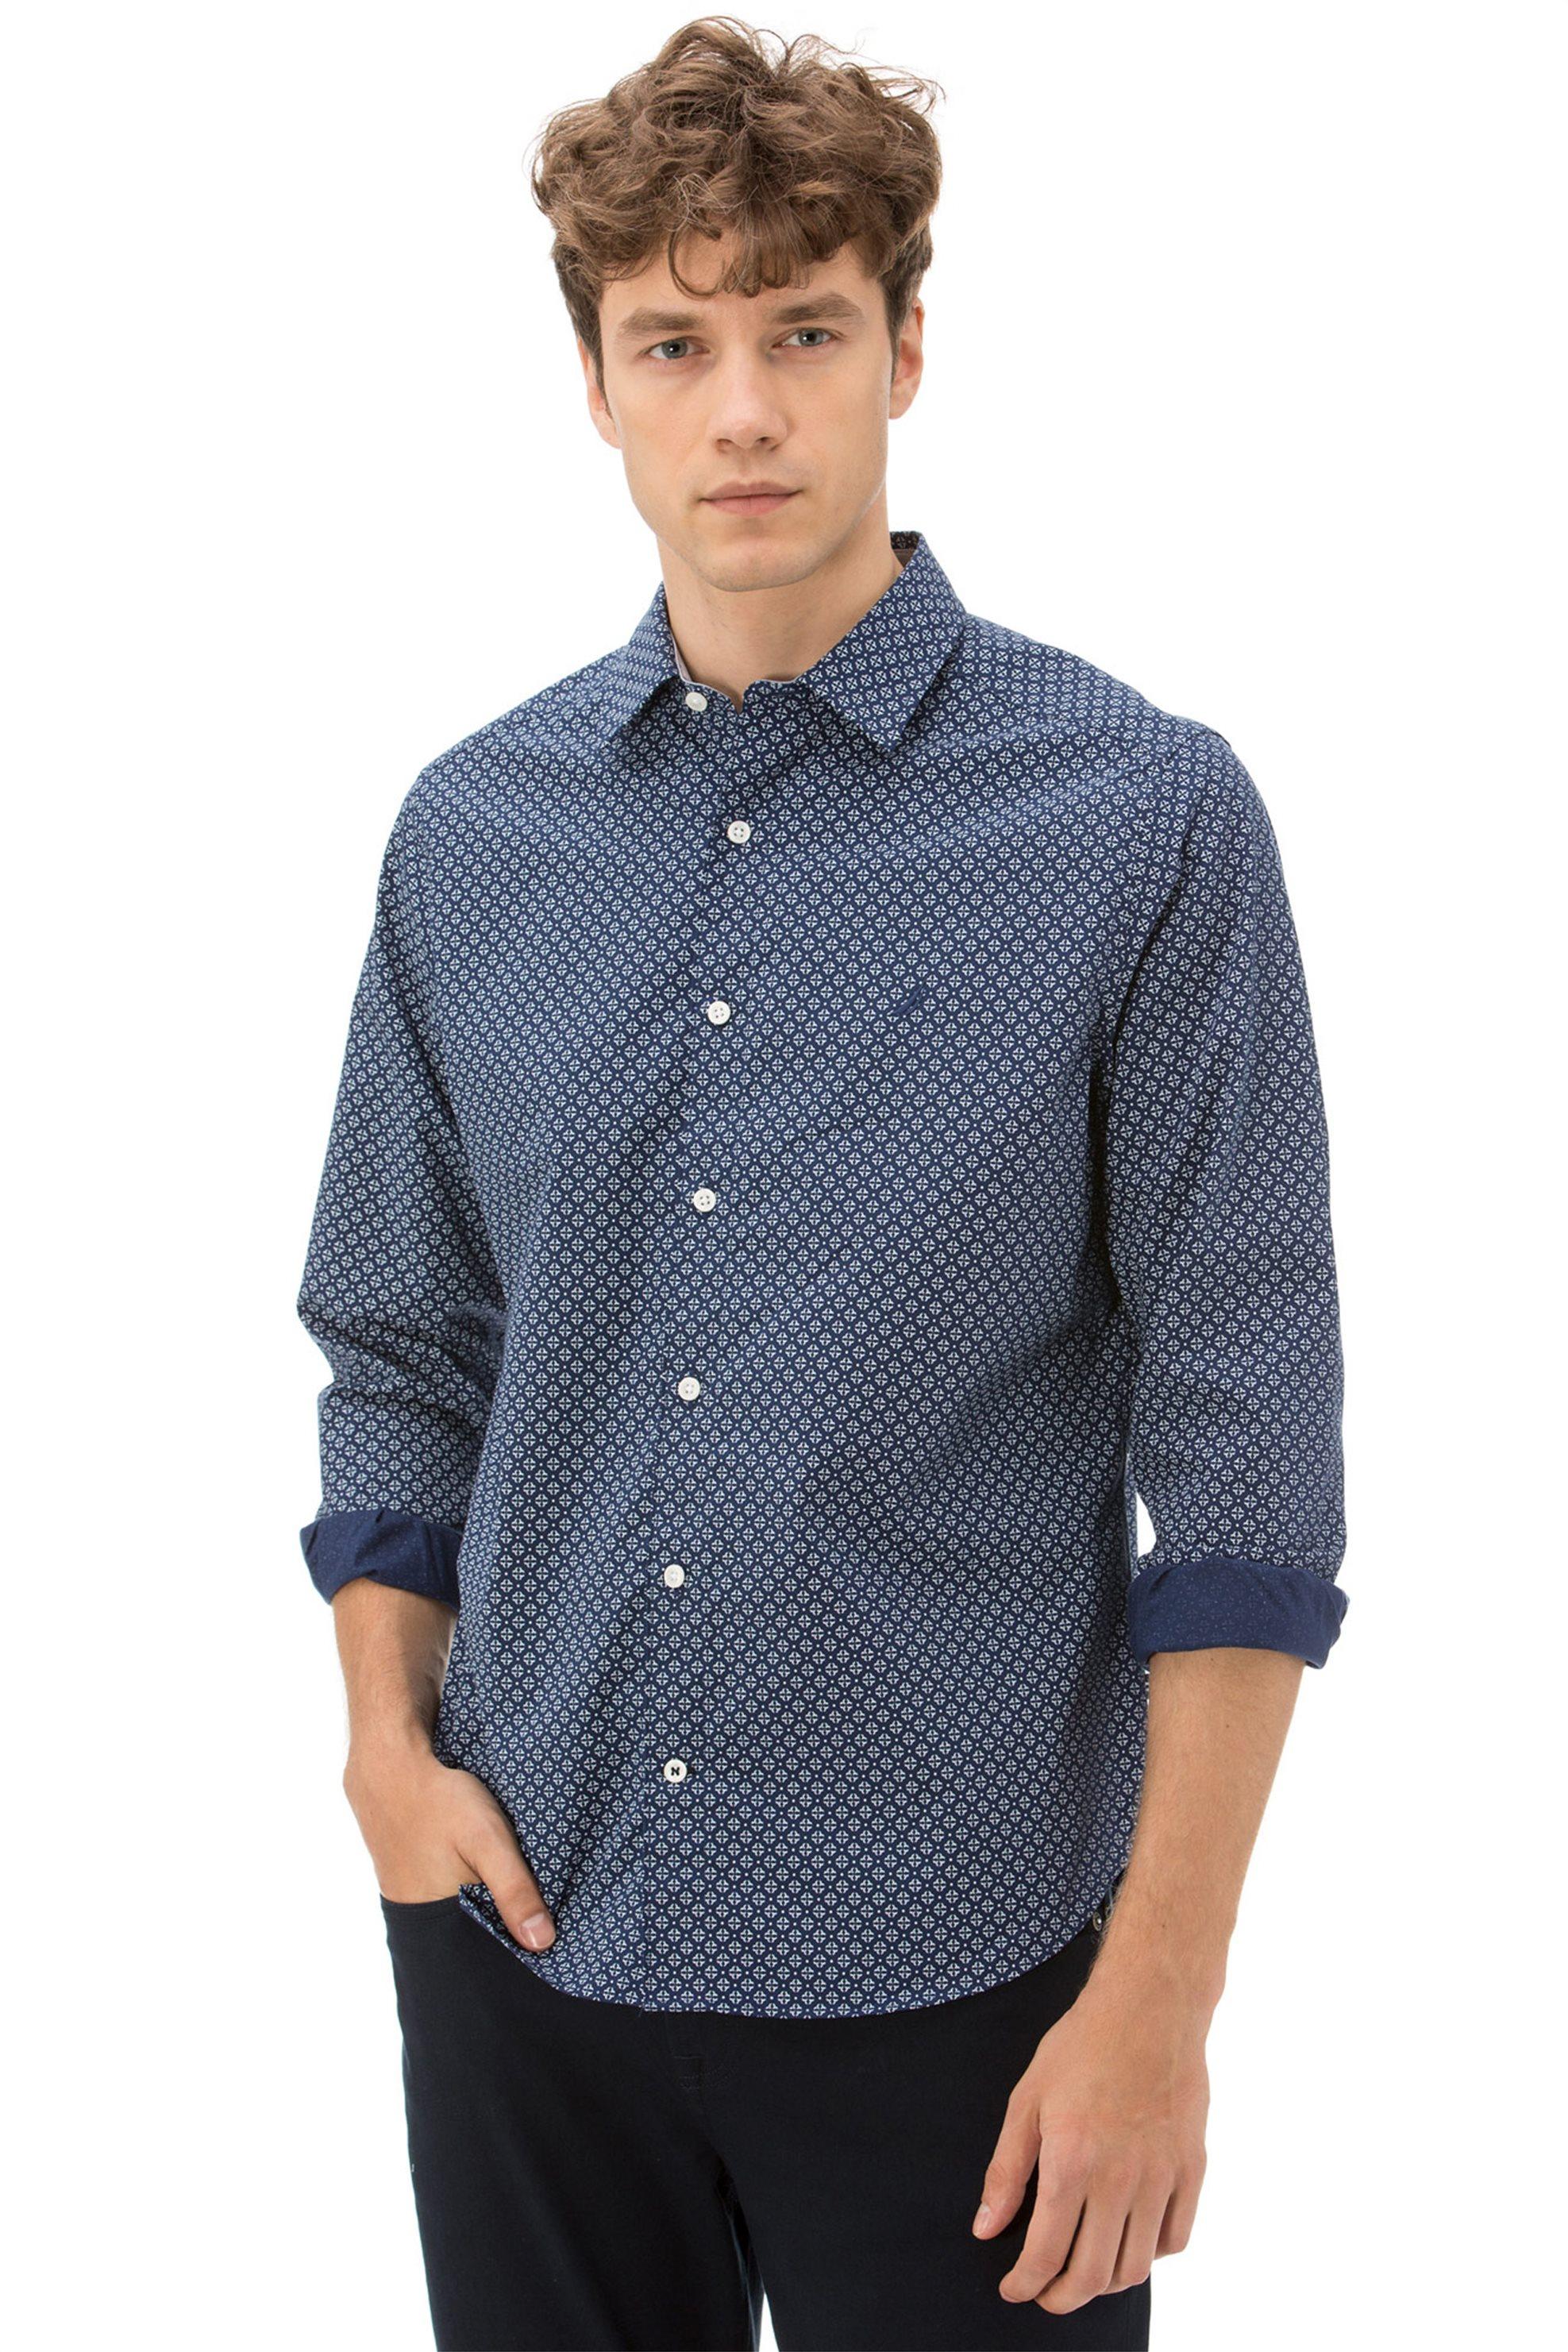 1c120e8cb2cd Notos Nautica ανδρικό πουκάμισο με μικροσχέδιο all-over - W83958 - Μπλε  Σκούρο